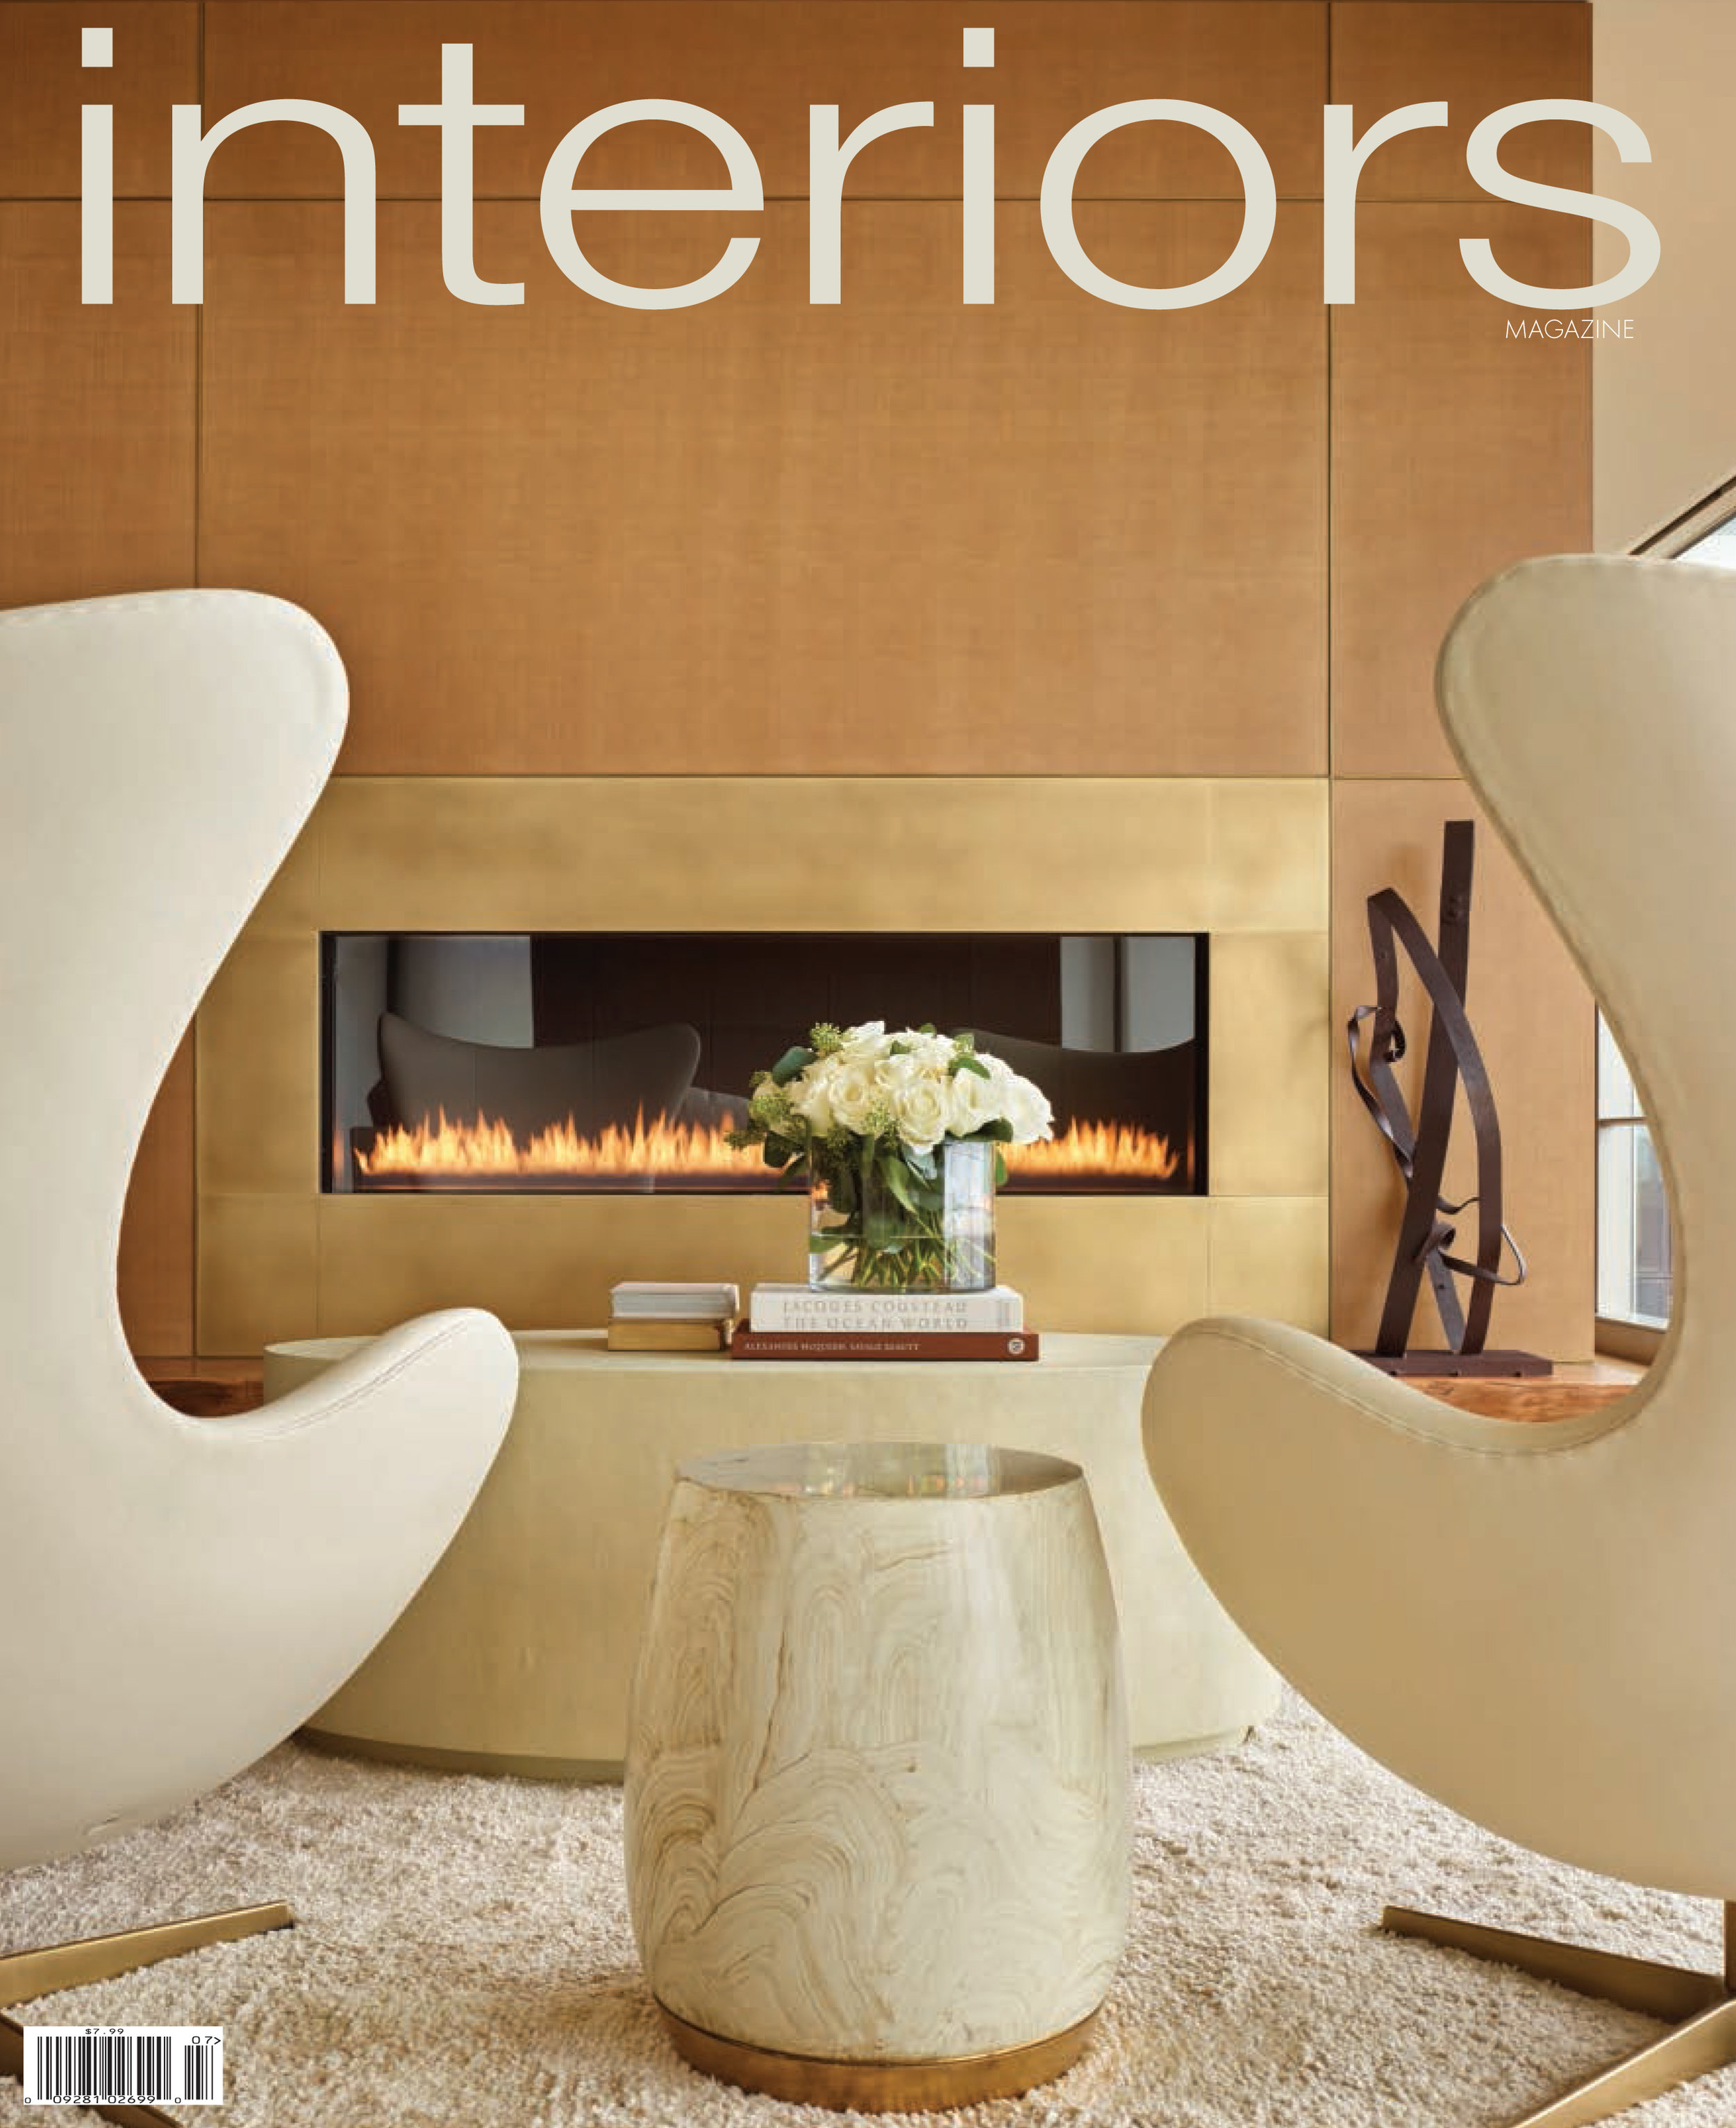 Interiors June + July 2013